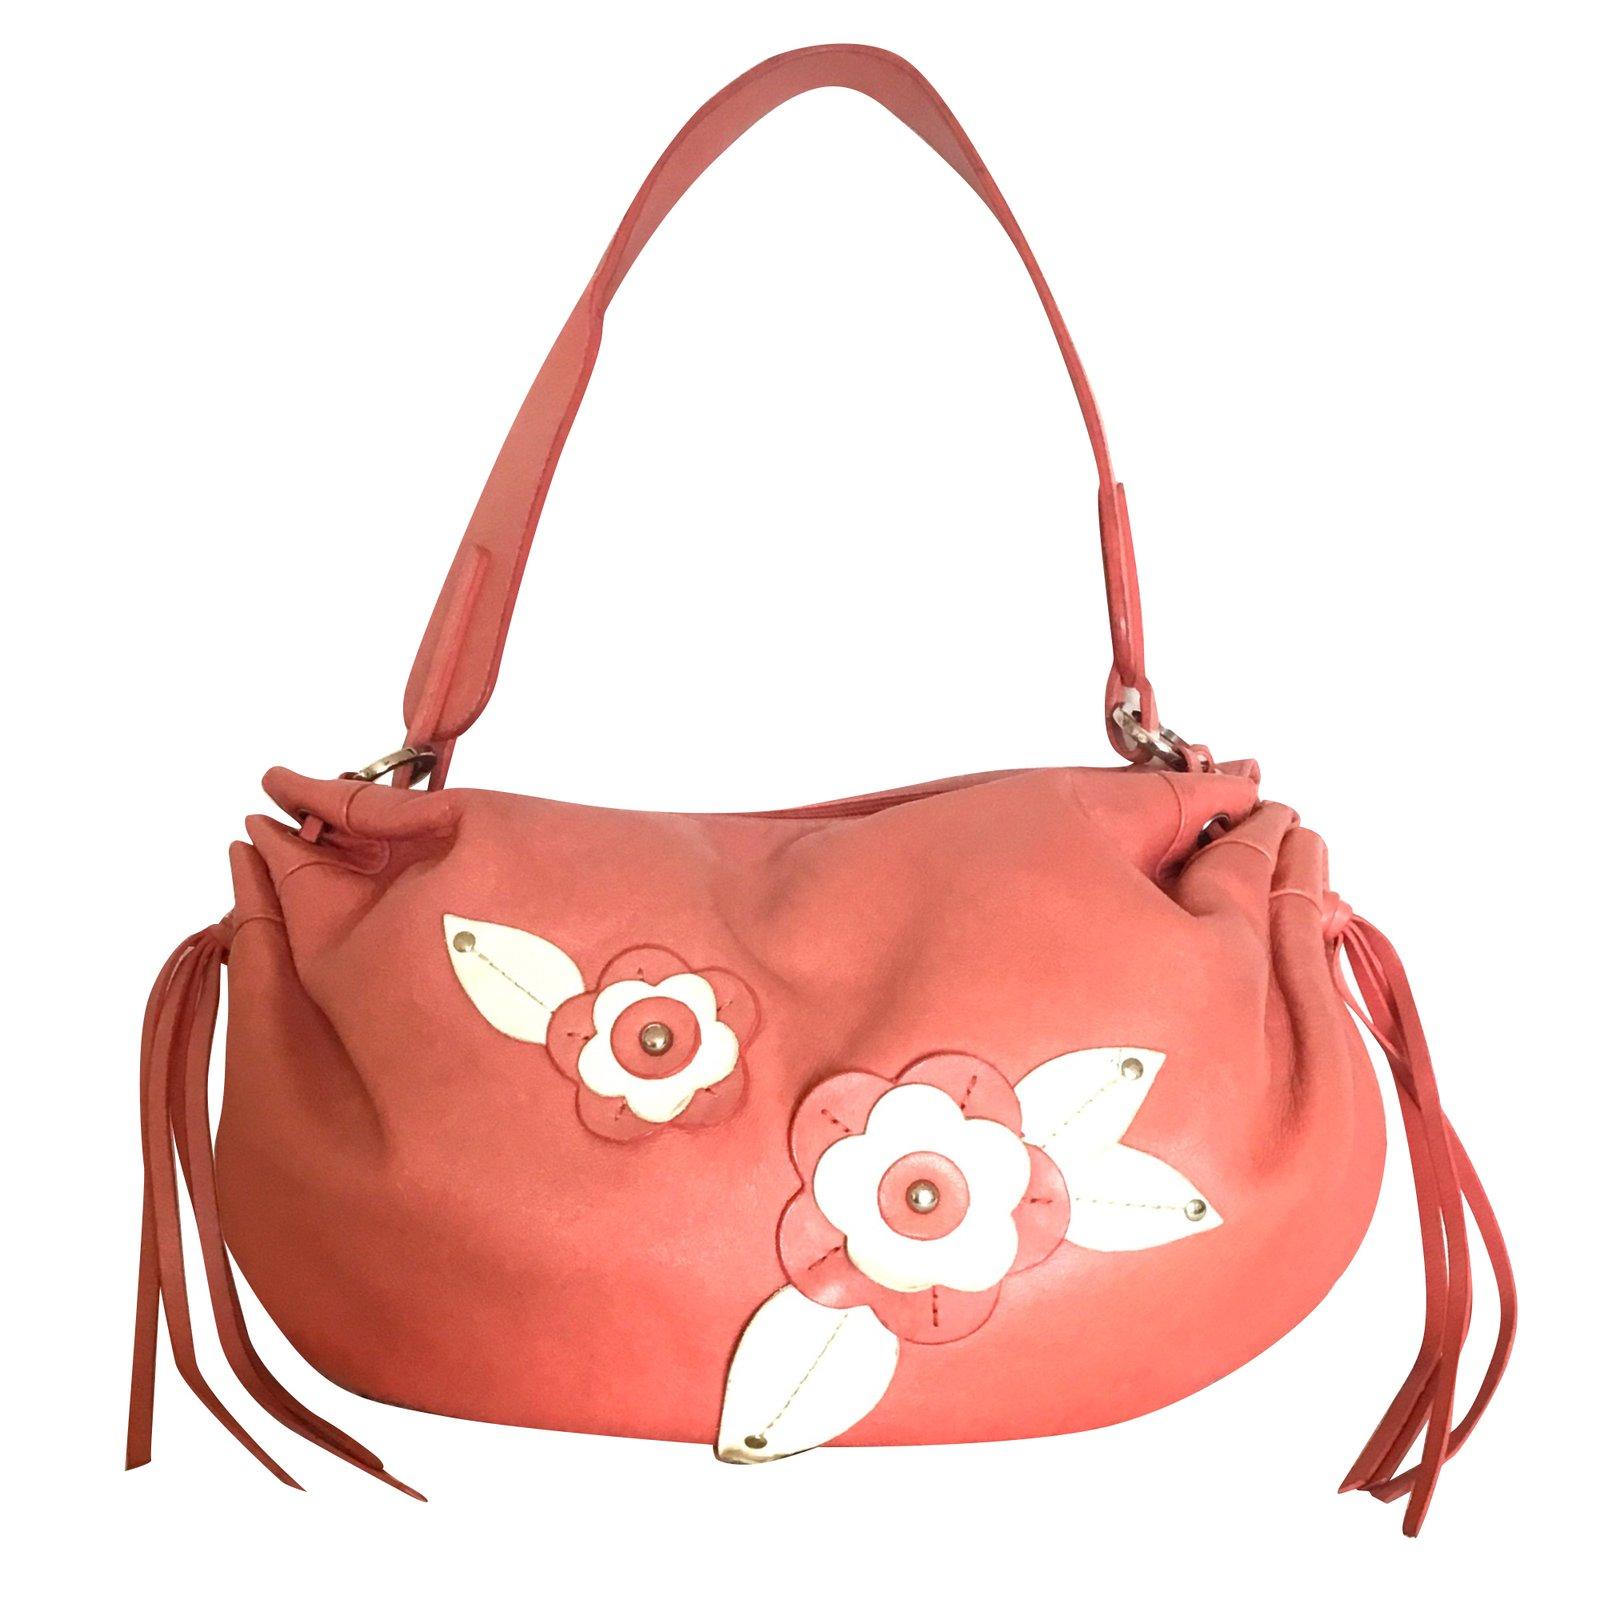 Lancel Handbag Handbags Leather Pink Orange Ref 70125